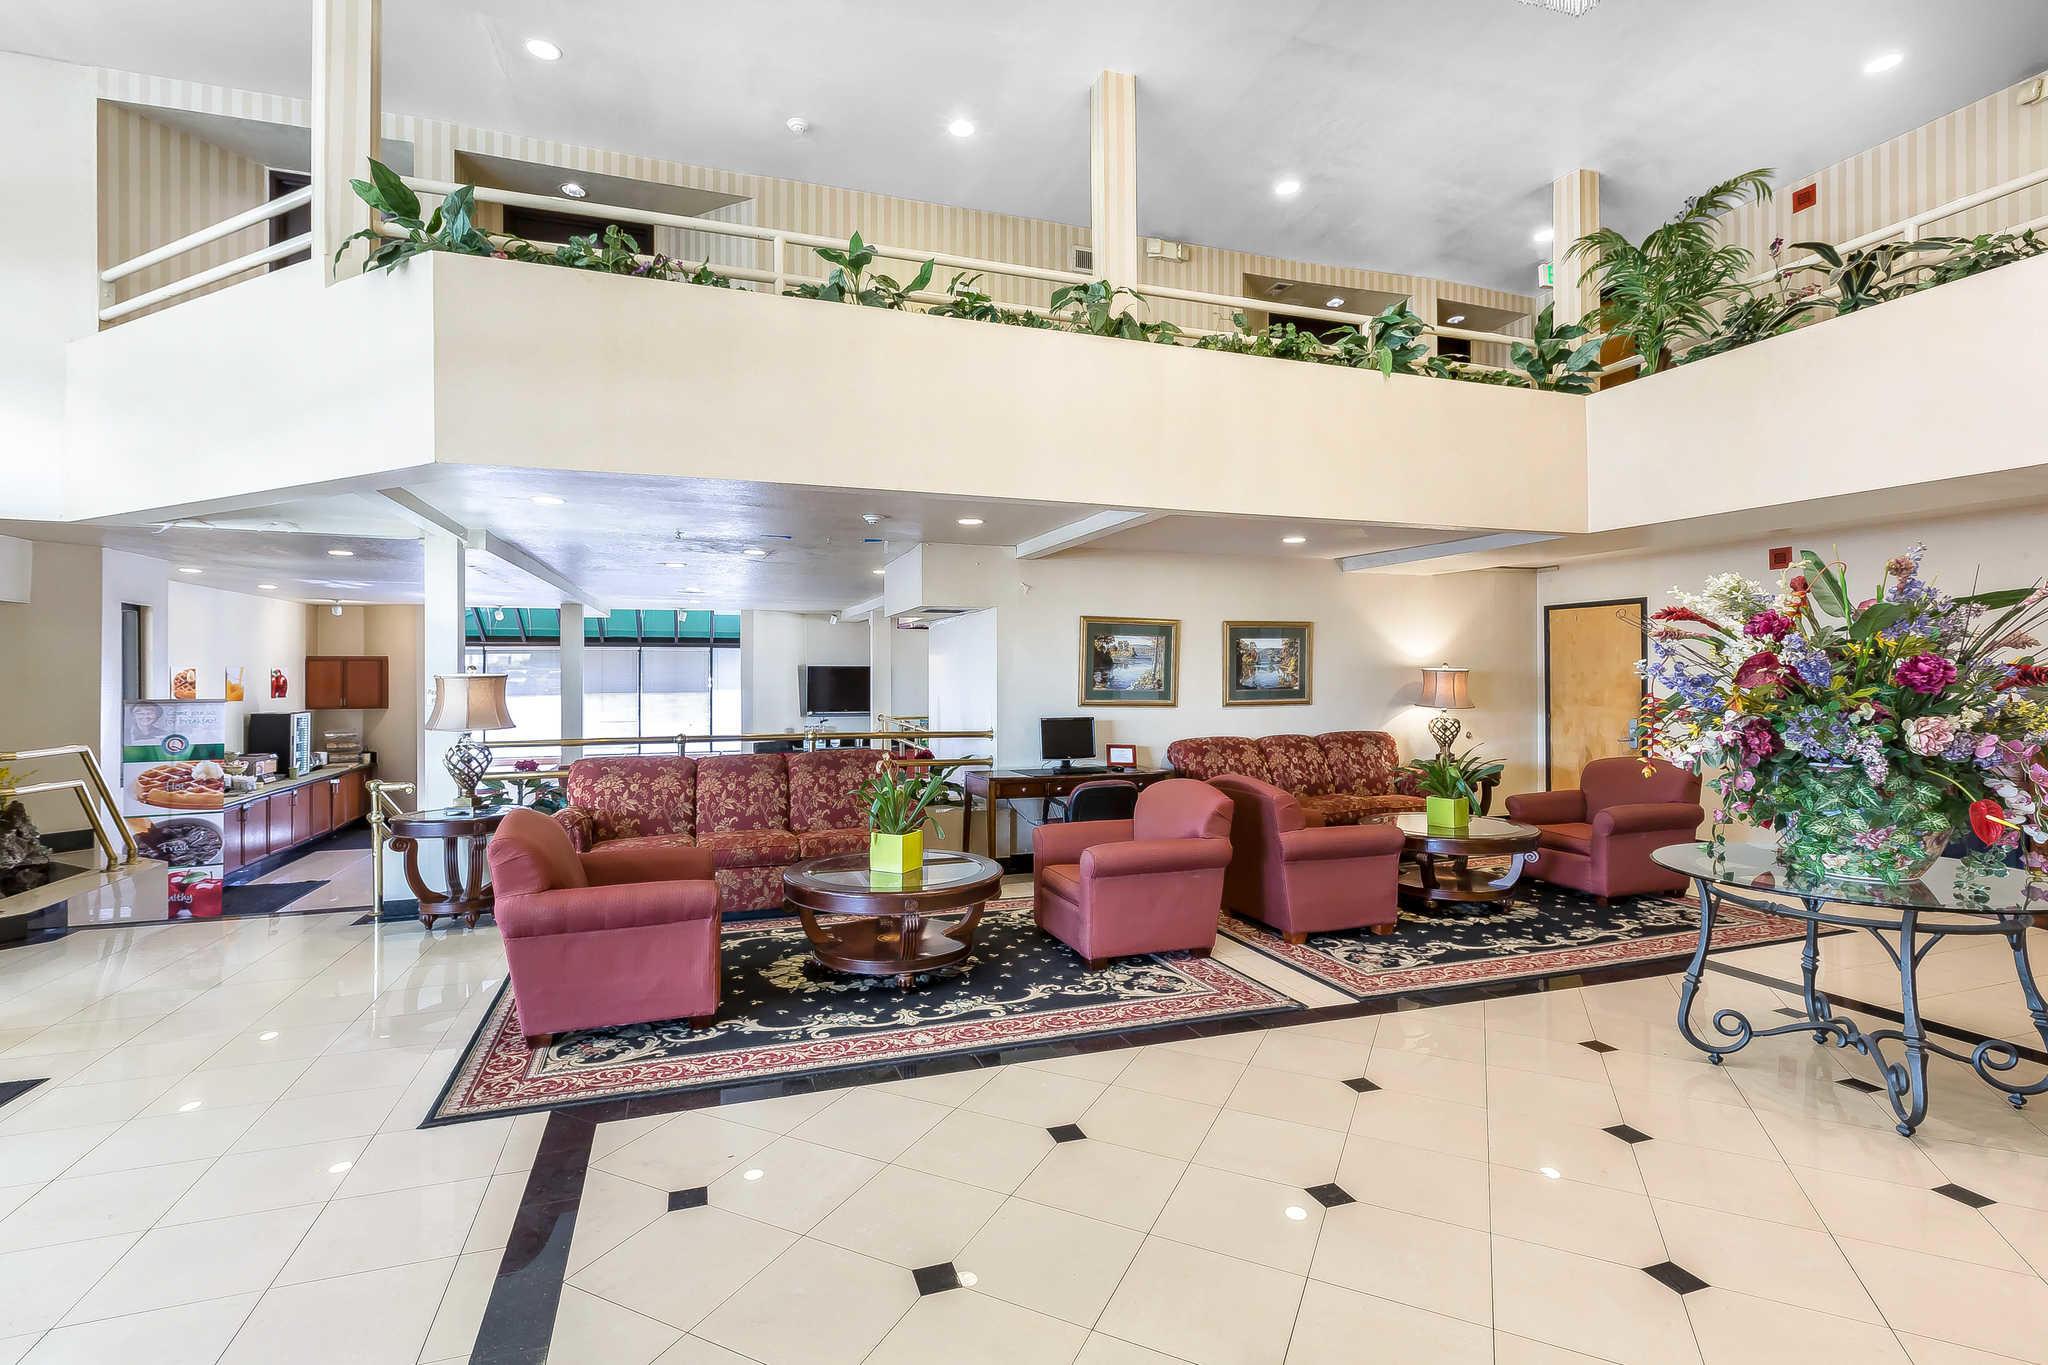 Pet Friendly Hotels In South Orange County Ca